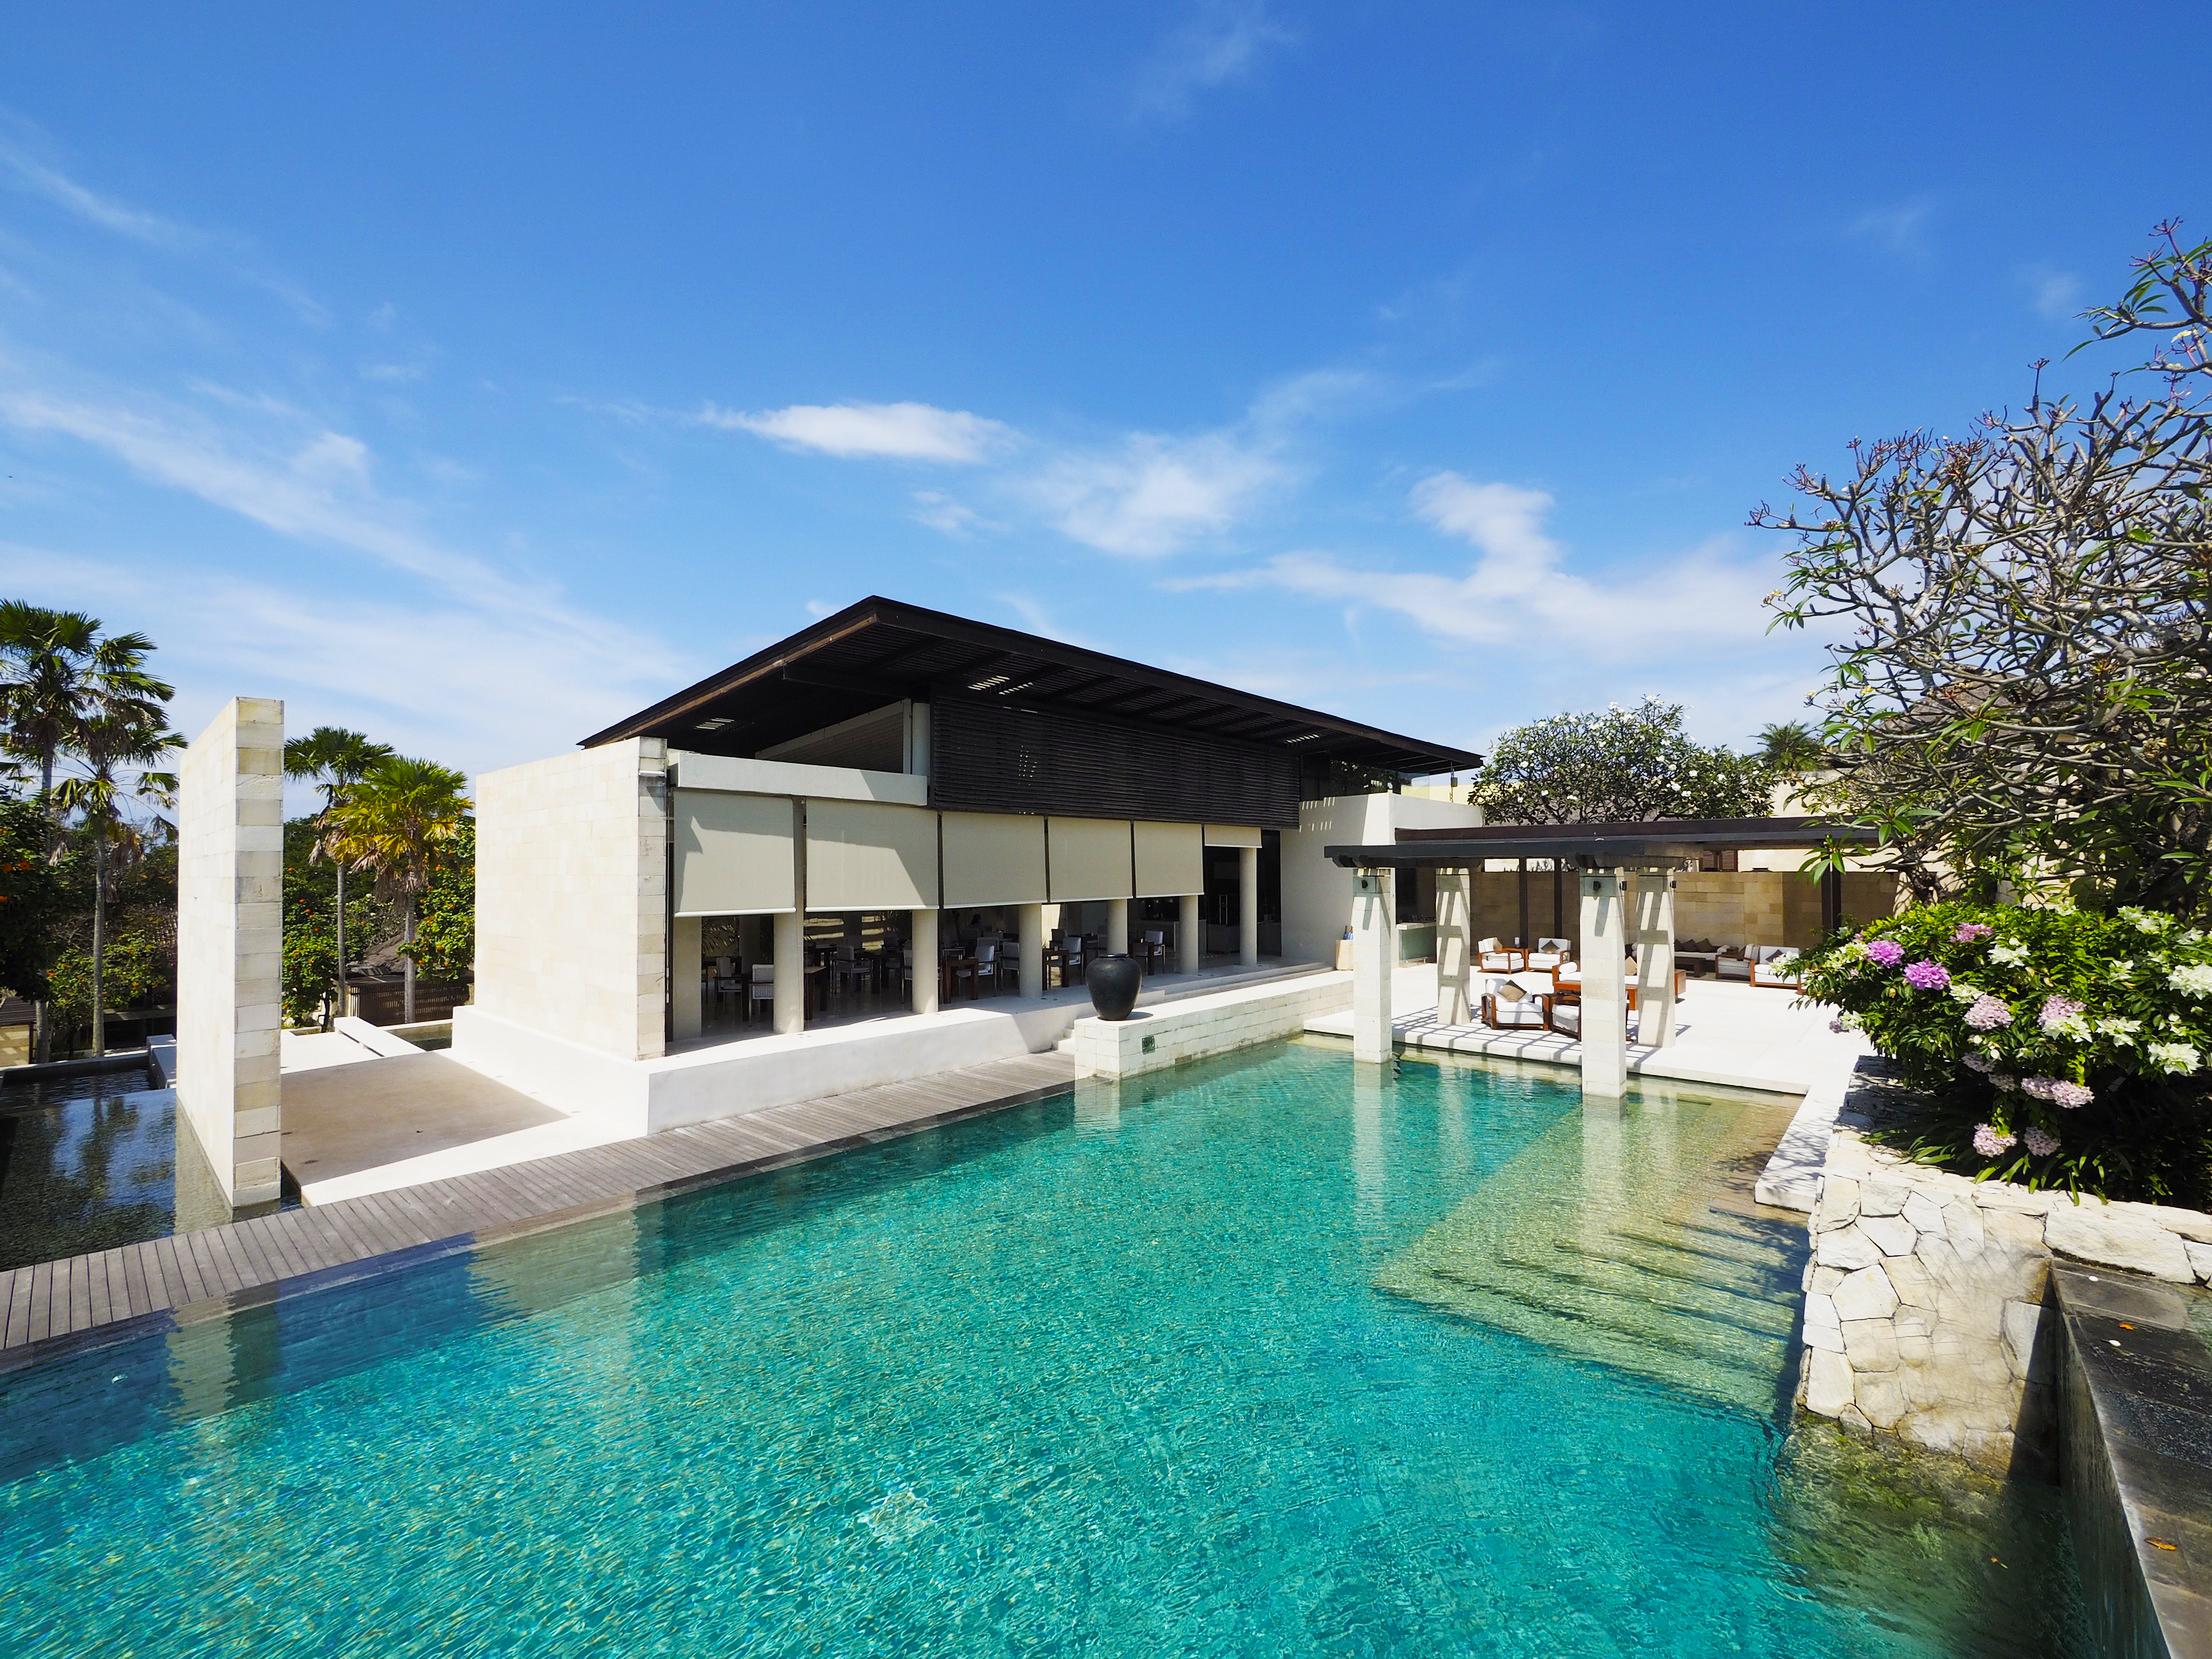 The Bale Villas, Luxury retreat - Nusa Dua / Bali